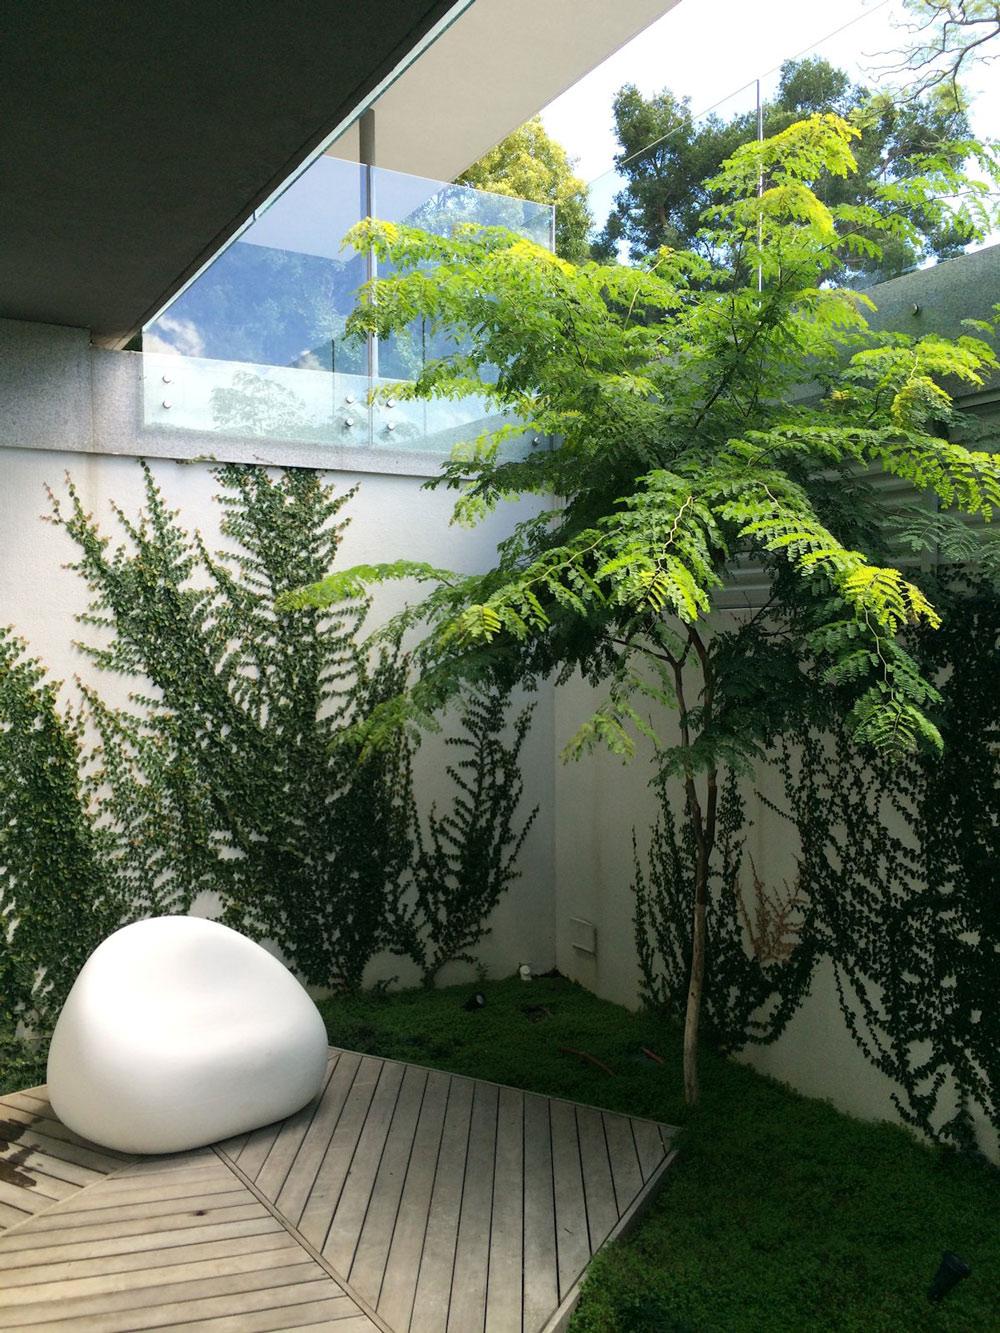 Courtyard, Garden, Art, House in Tamboerskloof, Cape Town